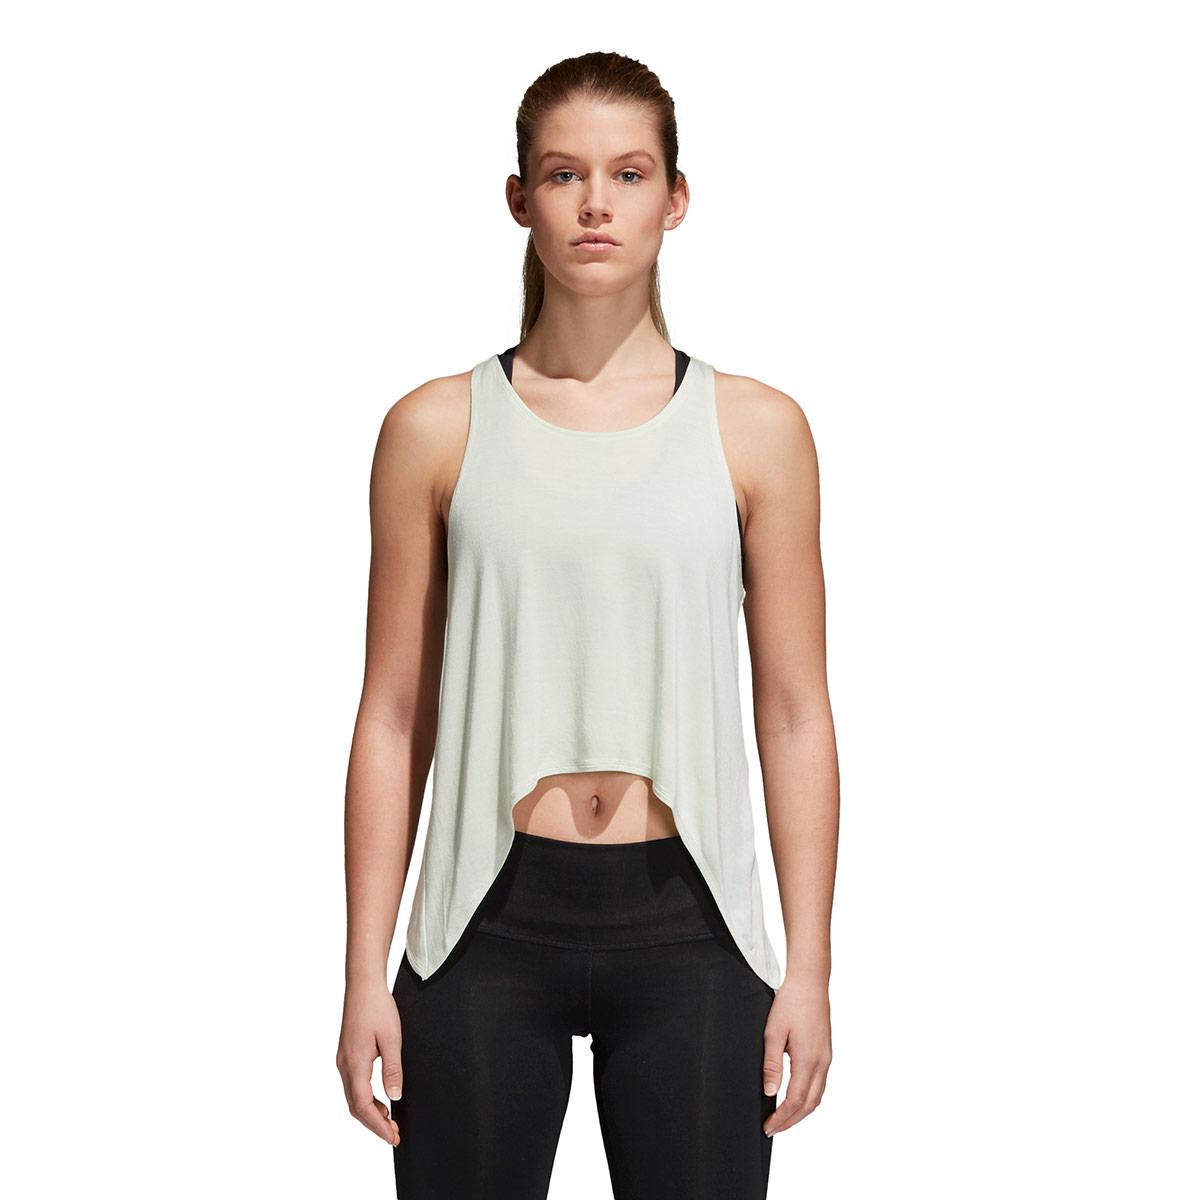 49965fa2dda365 adidas Climalite Knot Tanktop - Fitness tops for Women - Grey